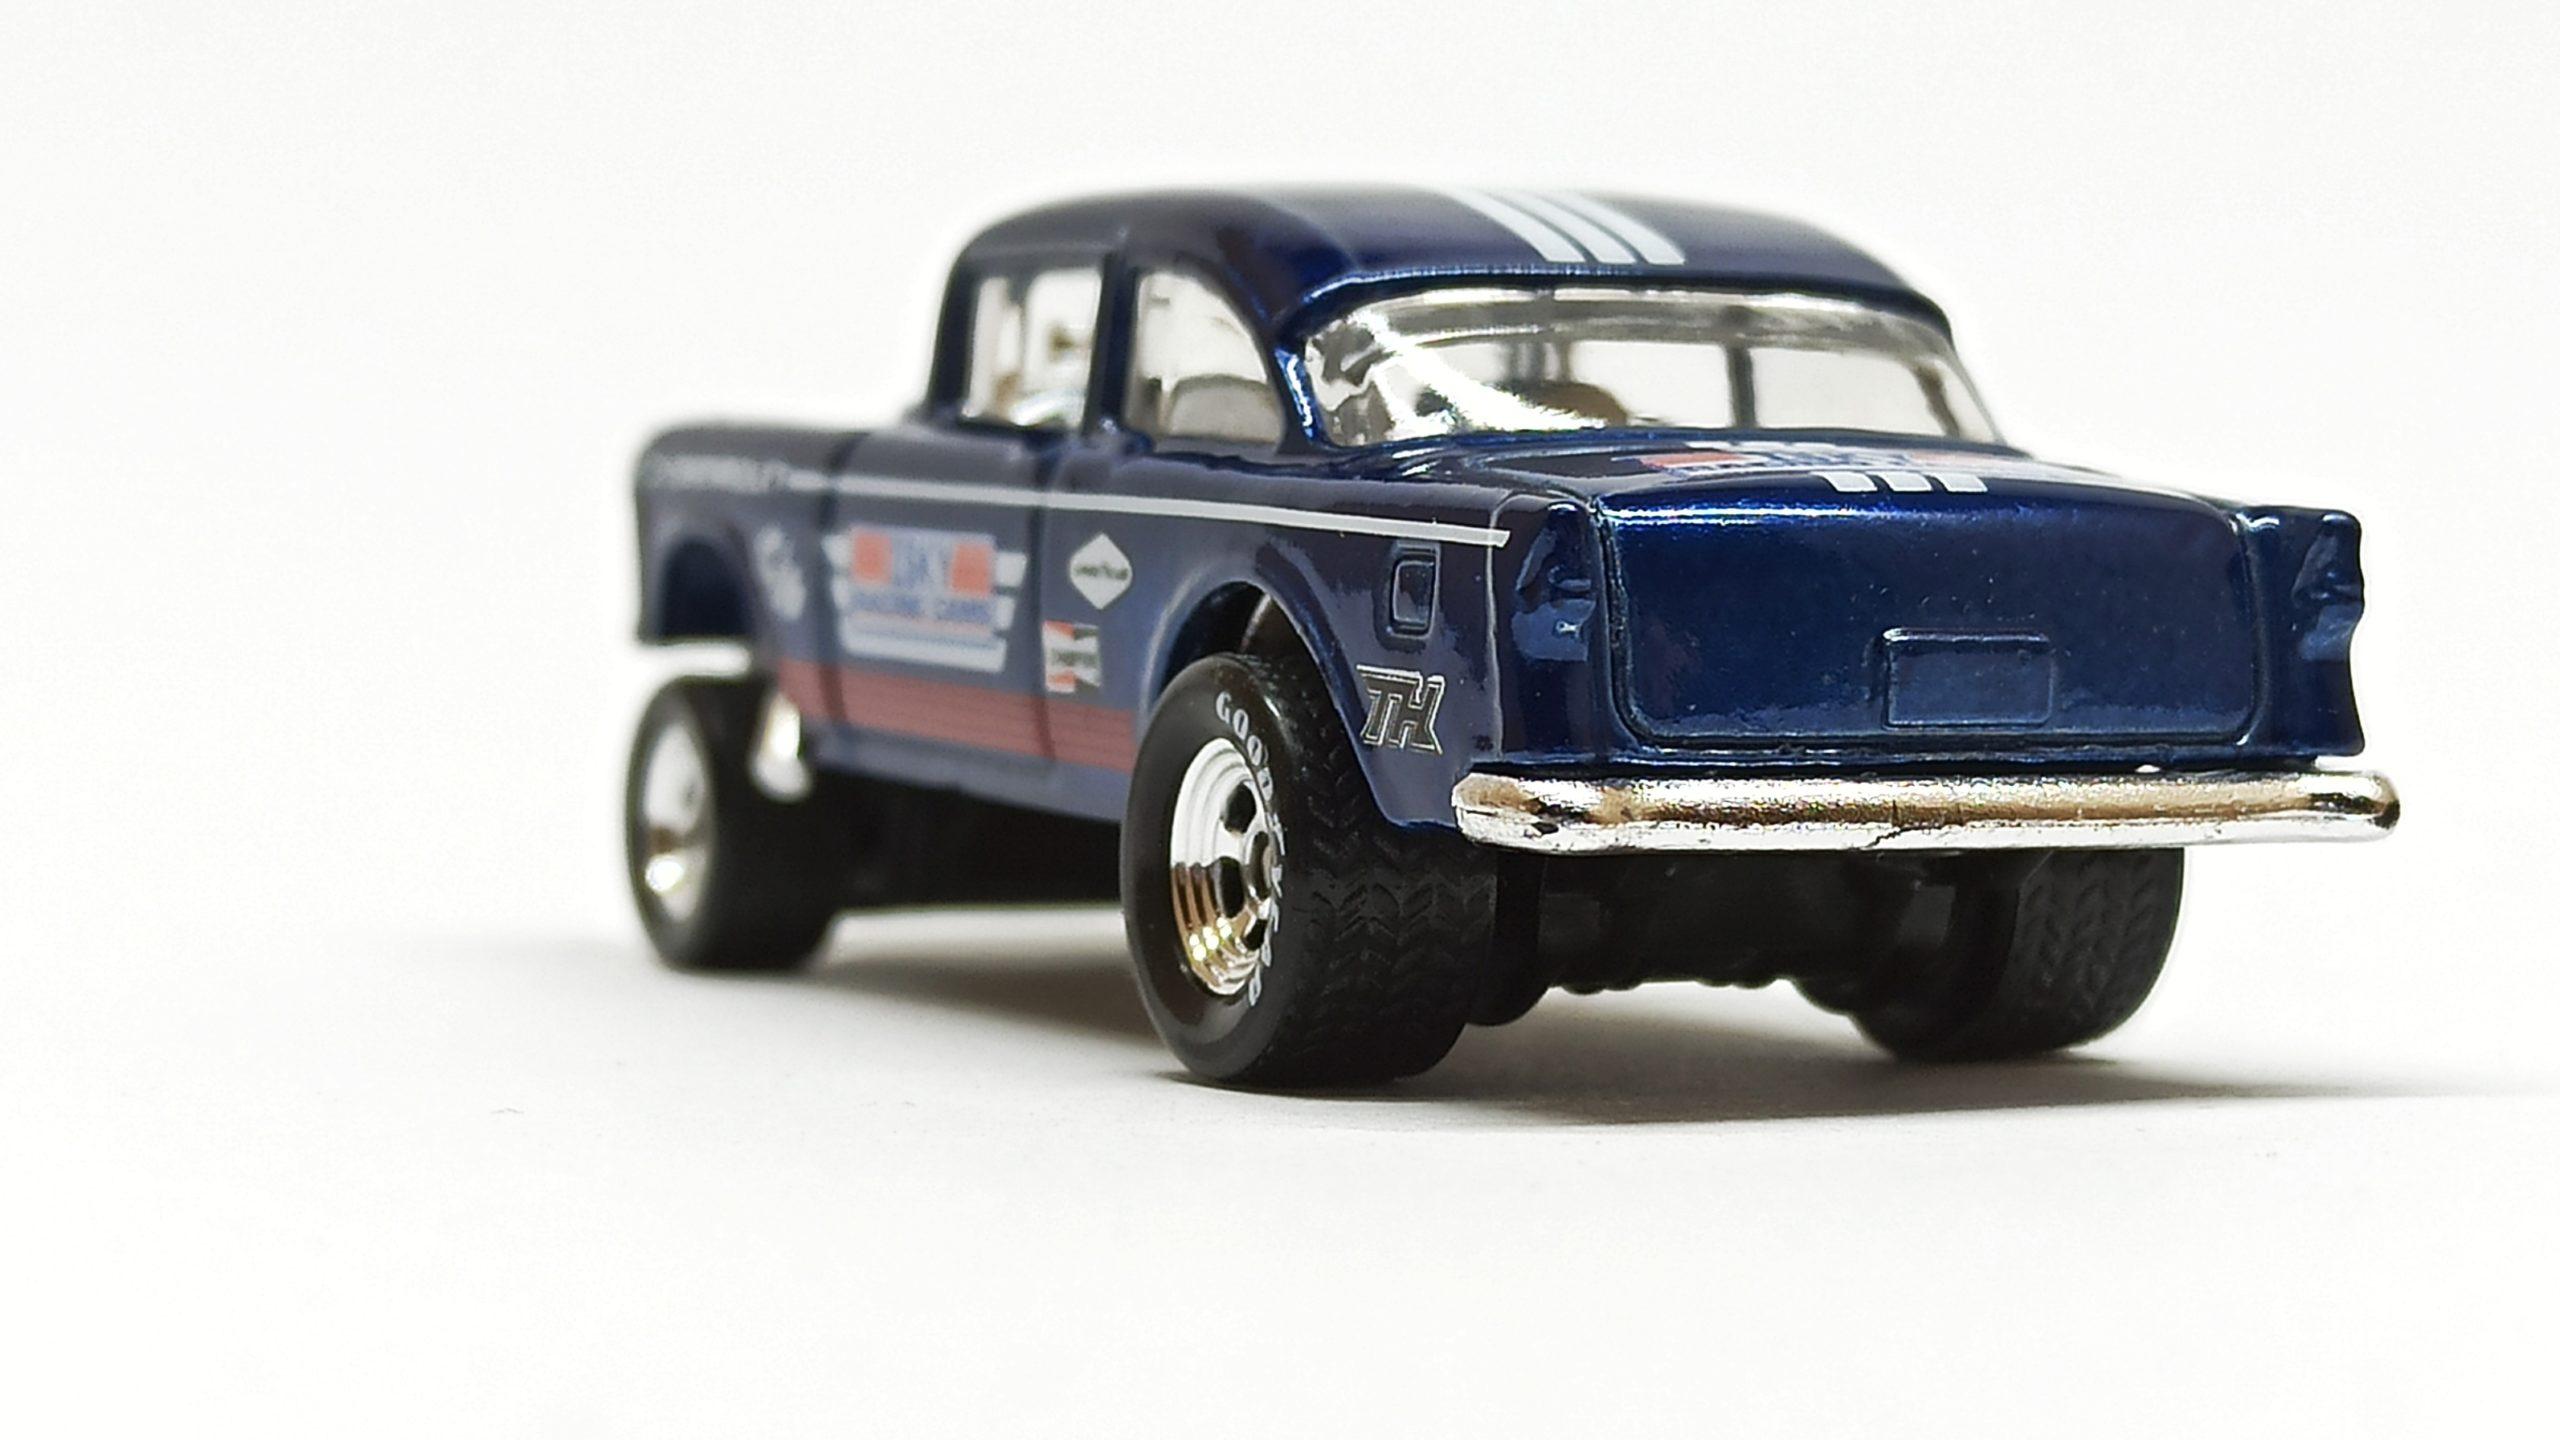 Hot Wheels '55 Chevy Bel Air Gasser (BFF38) 2014 (241/250) HW Workshop: HW Performance spectraflame dark blue Super Treasure Hunt (STH) back angle